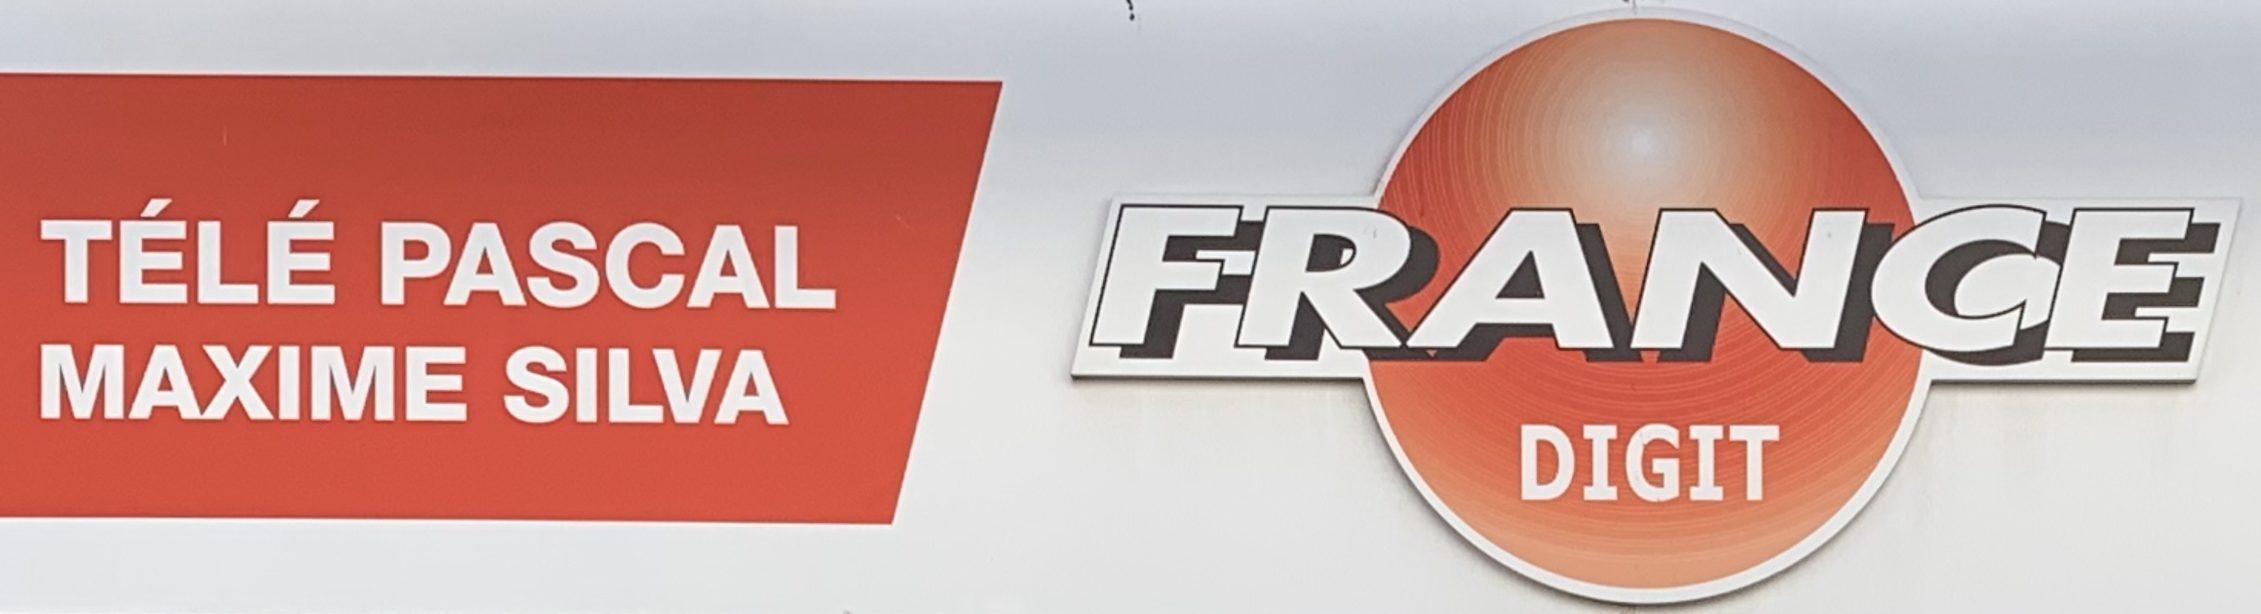 IMAGE – SON – MENAGER – 12 RUE DES ALPES – 04 75 43 46 38 – tv.pascal@tvpascal.fr